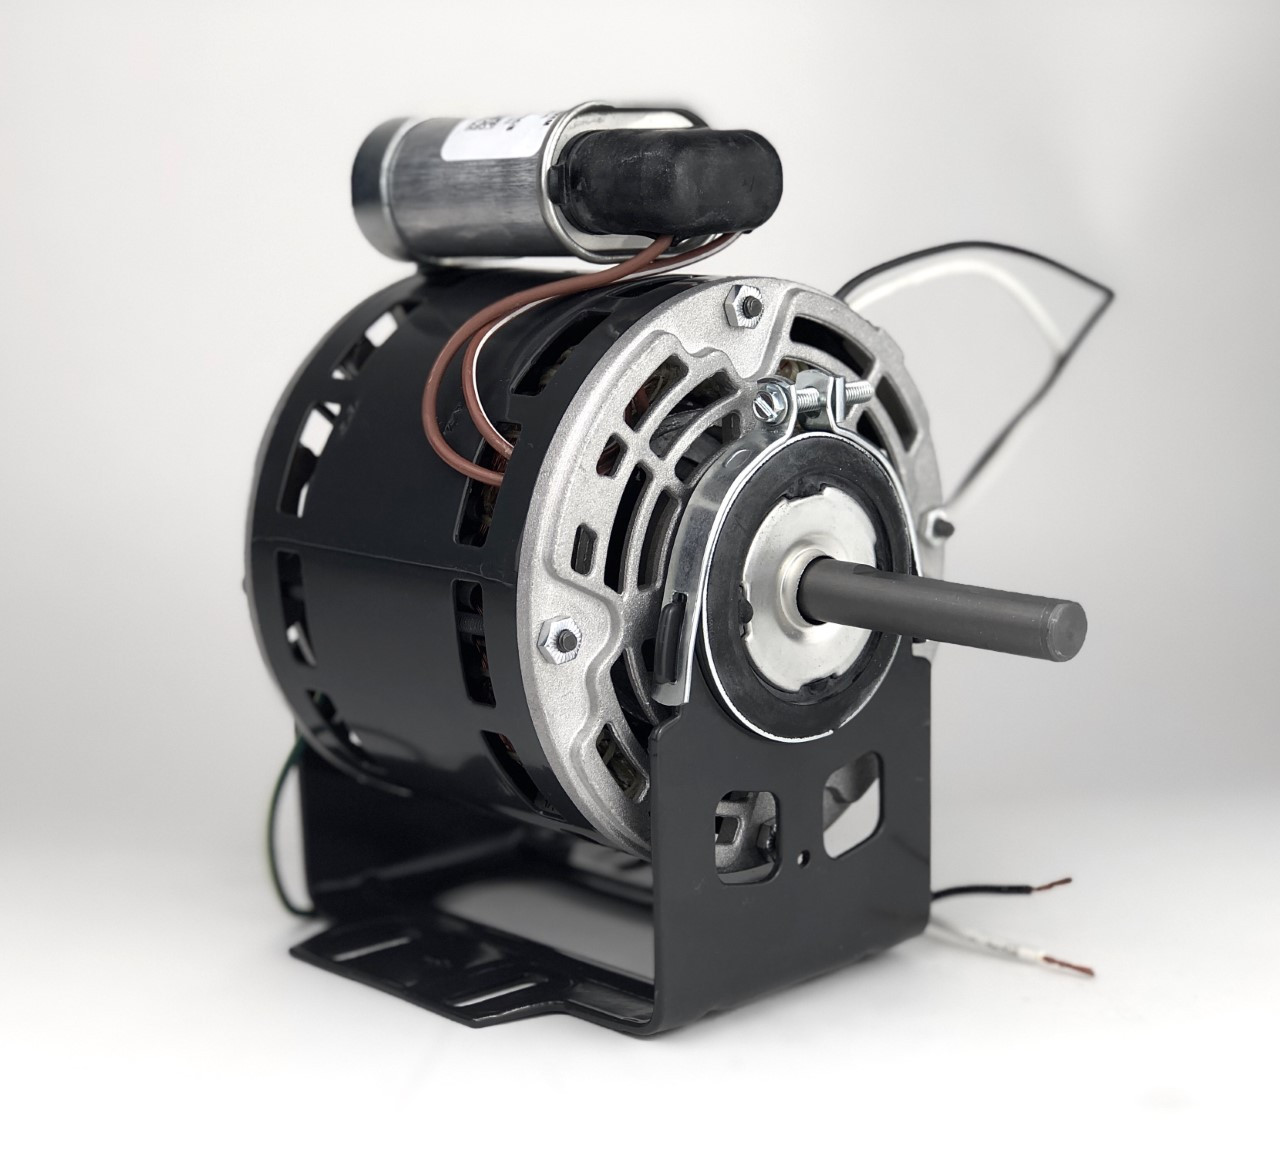 63821N Electric Motor (7185-0219, DF2G034, DF2F012, 63821-0, 63754-0 ) 1/4 hp, 1500 RPM 115 Volts